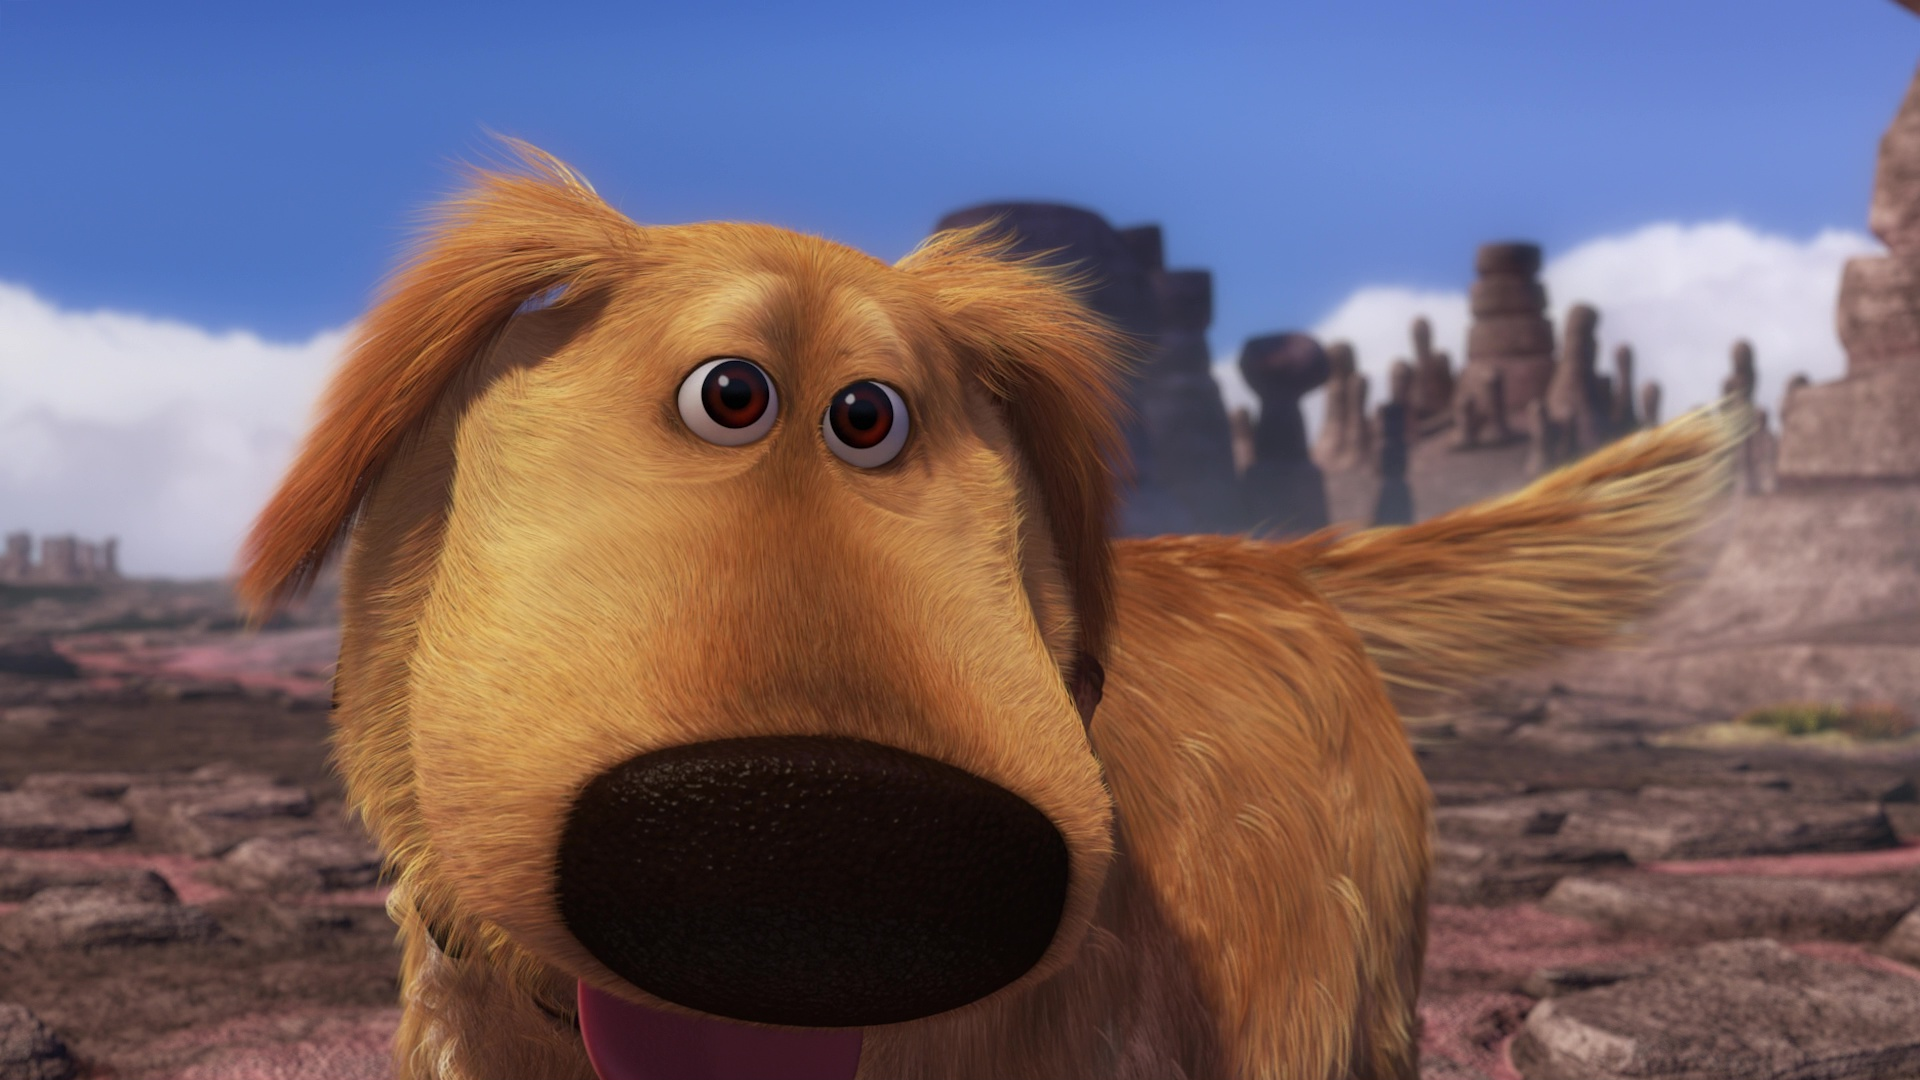 Pixar disney dug mission speciale